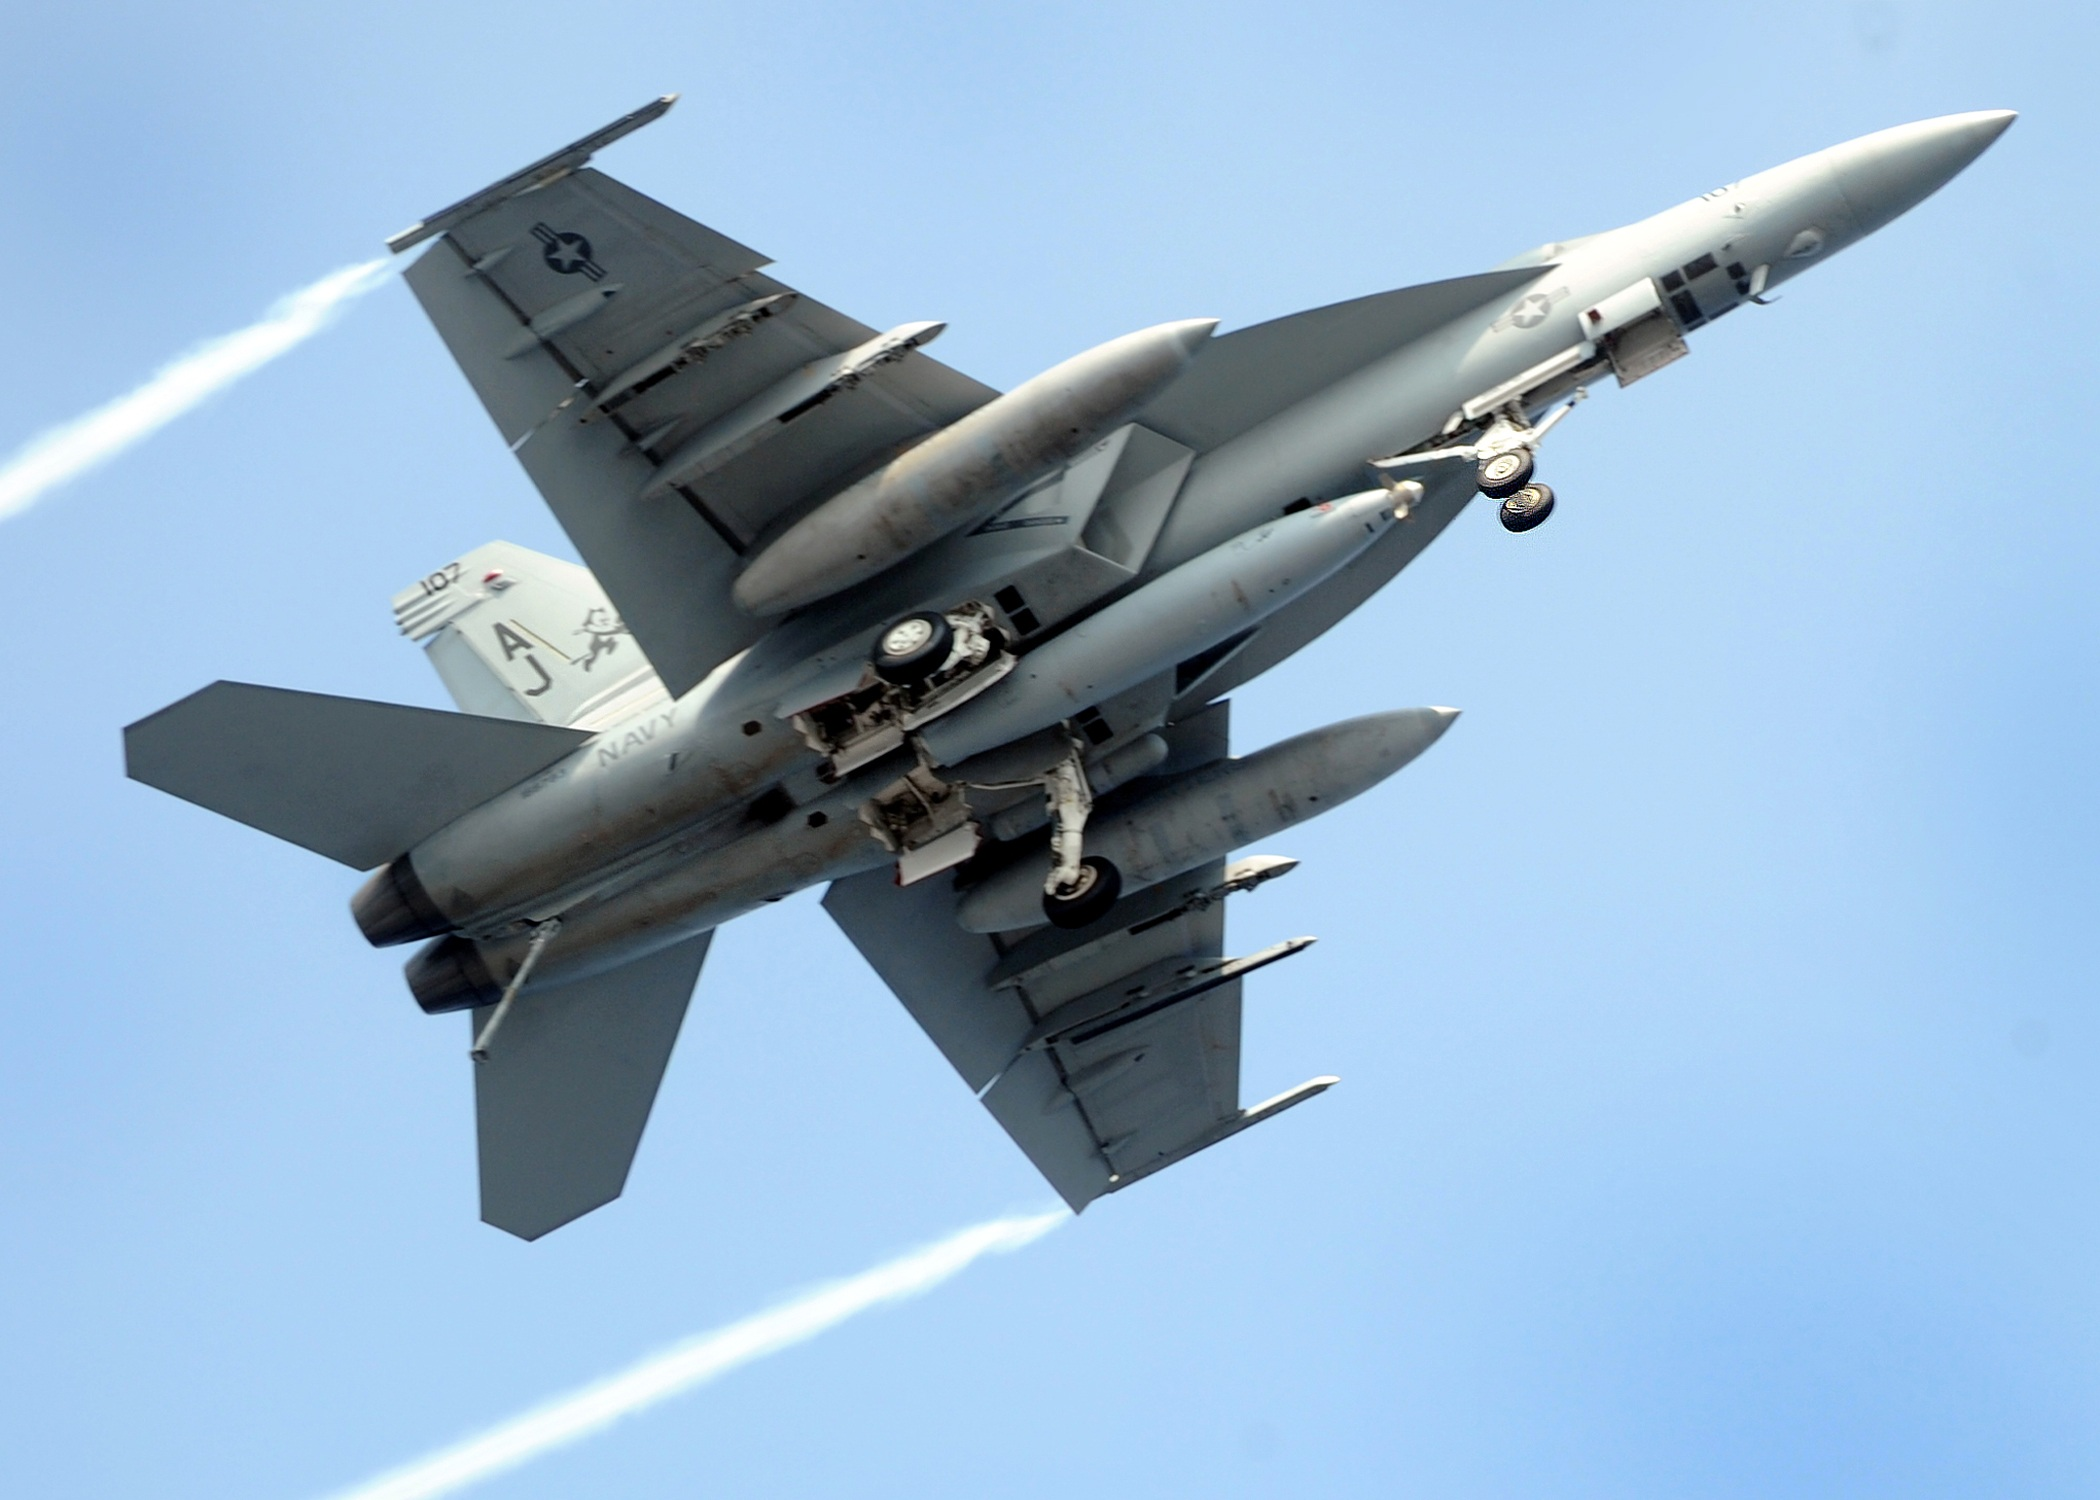 How the U.S. Military Helped Make Top Gun 2